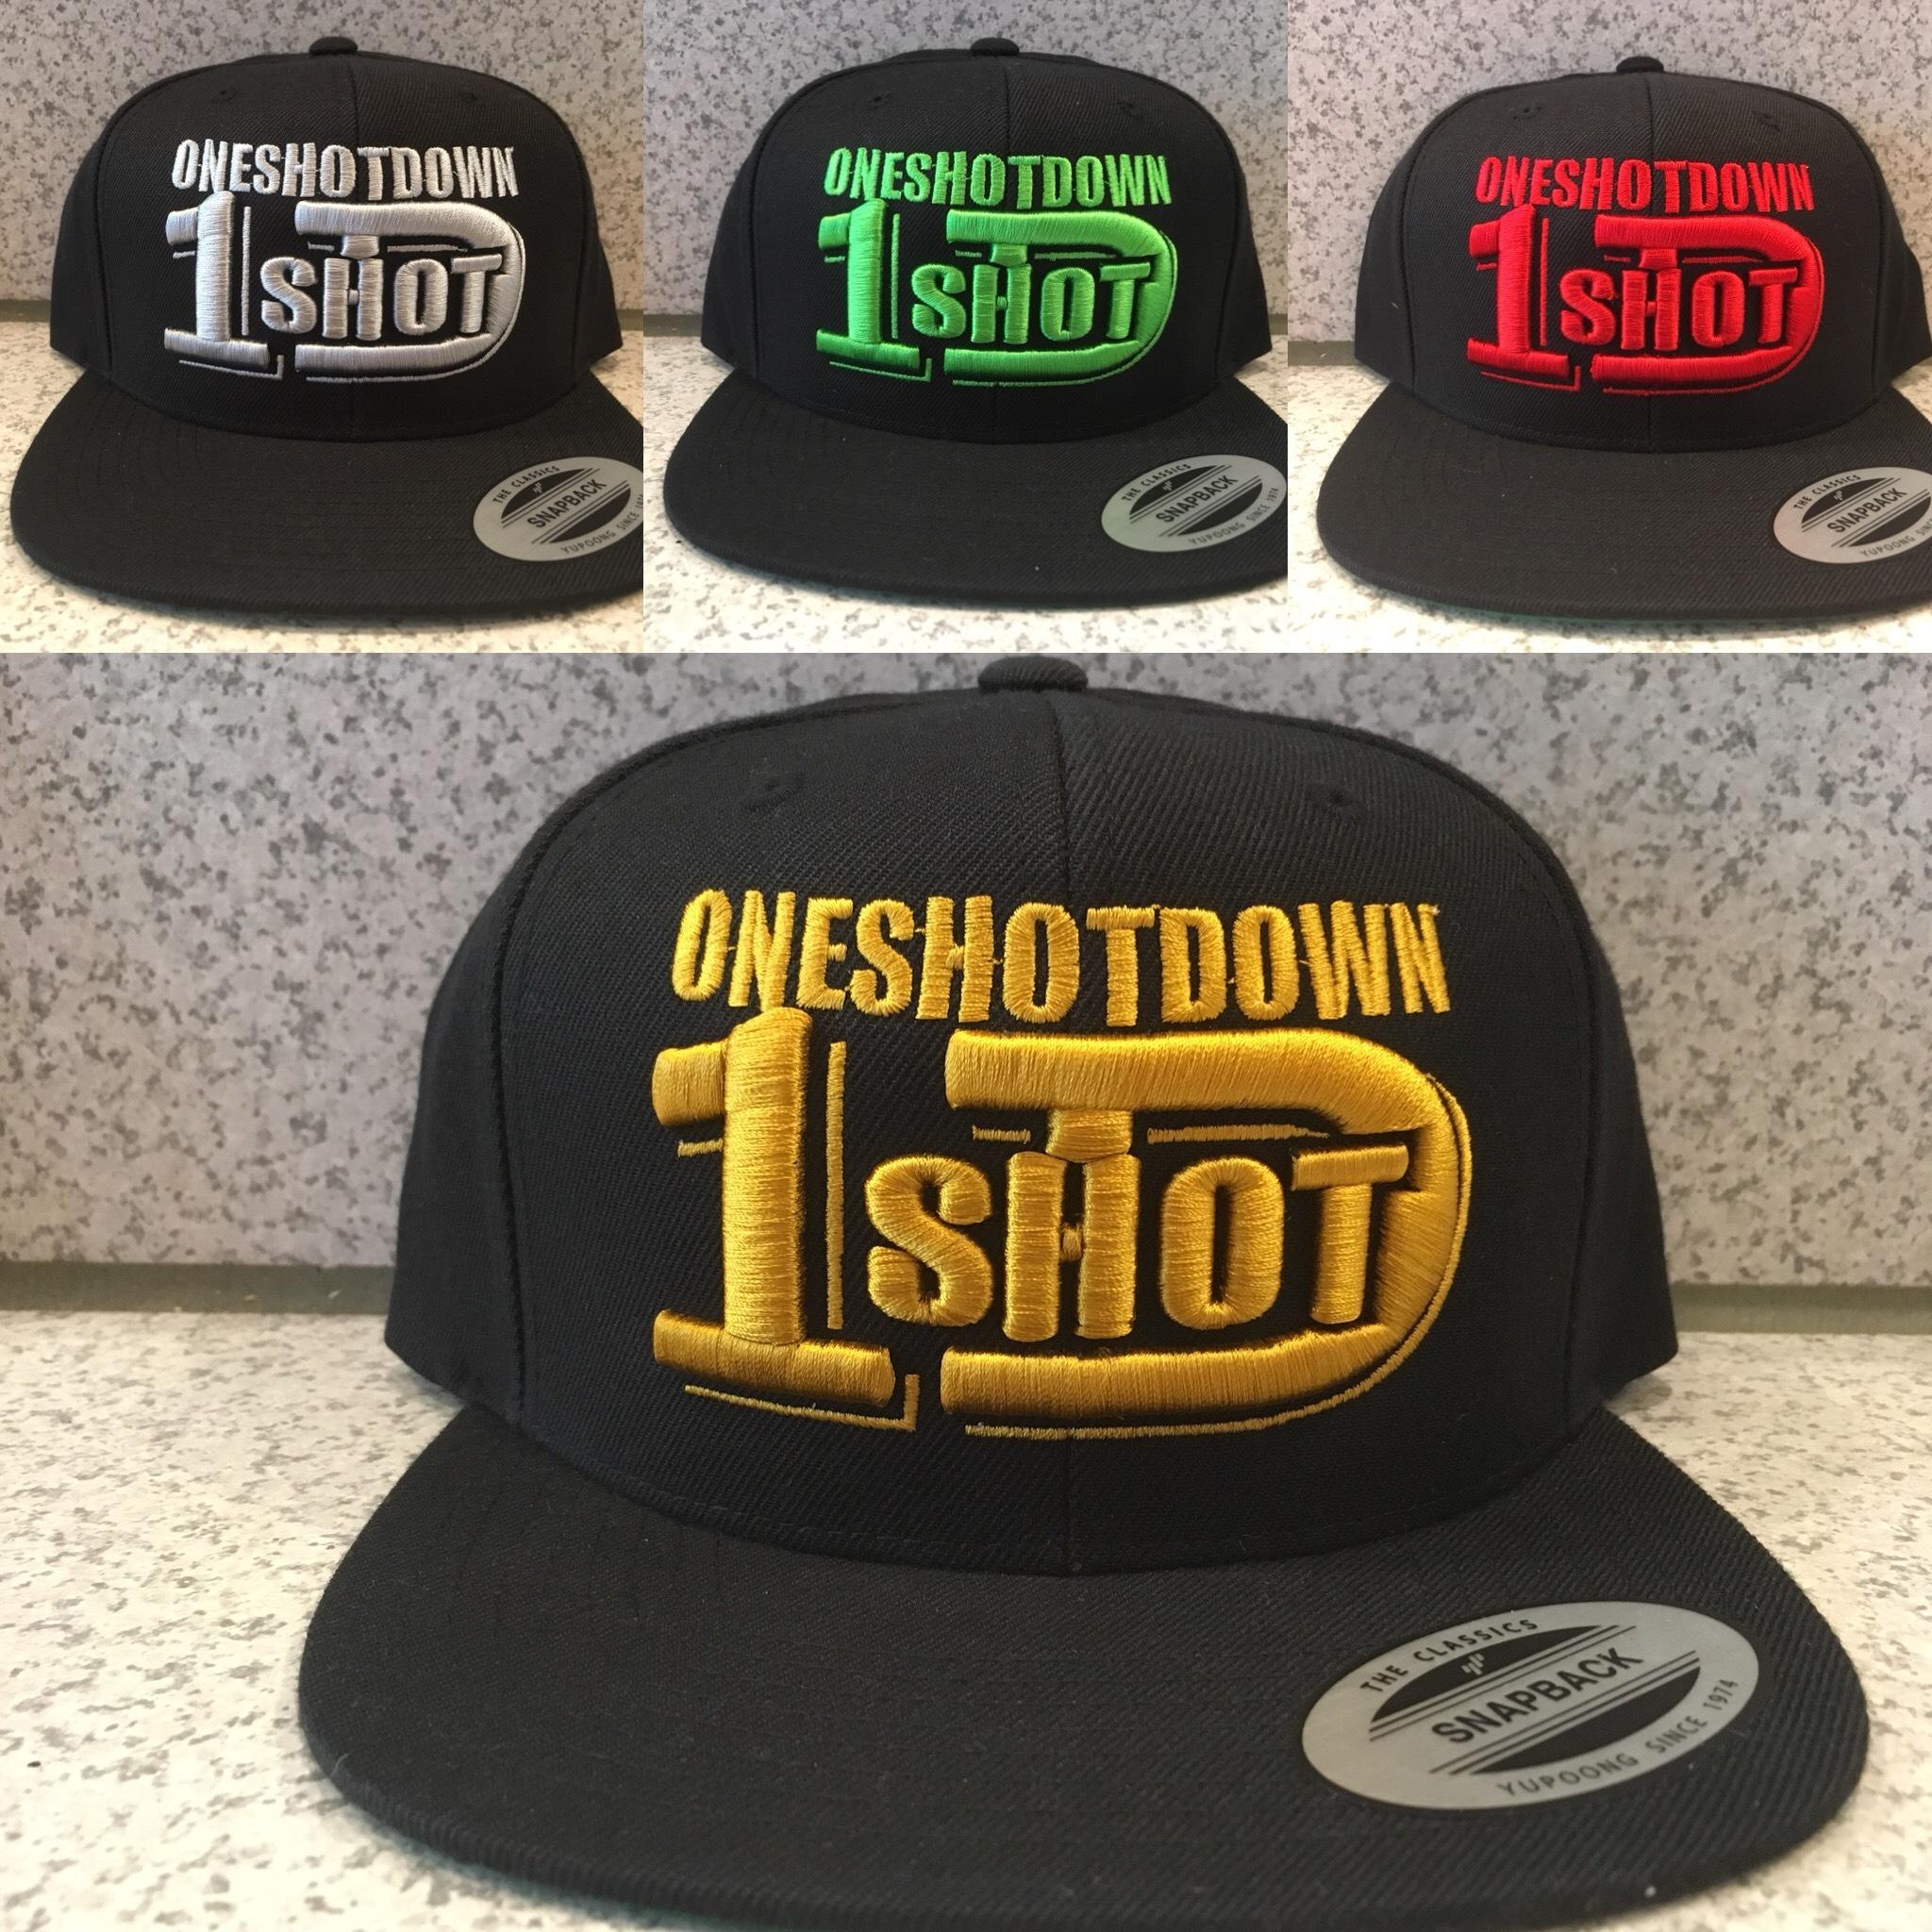 ONESHOTDOWNロゴ3D刺繍CAP - 画像5